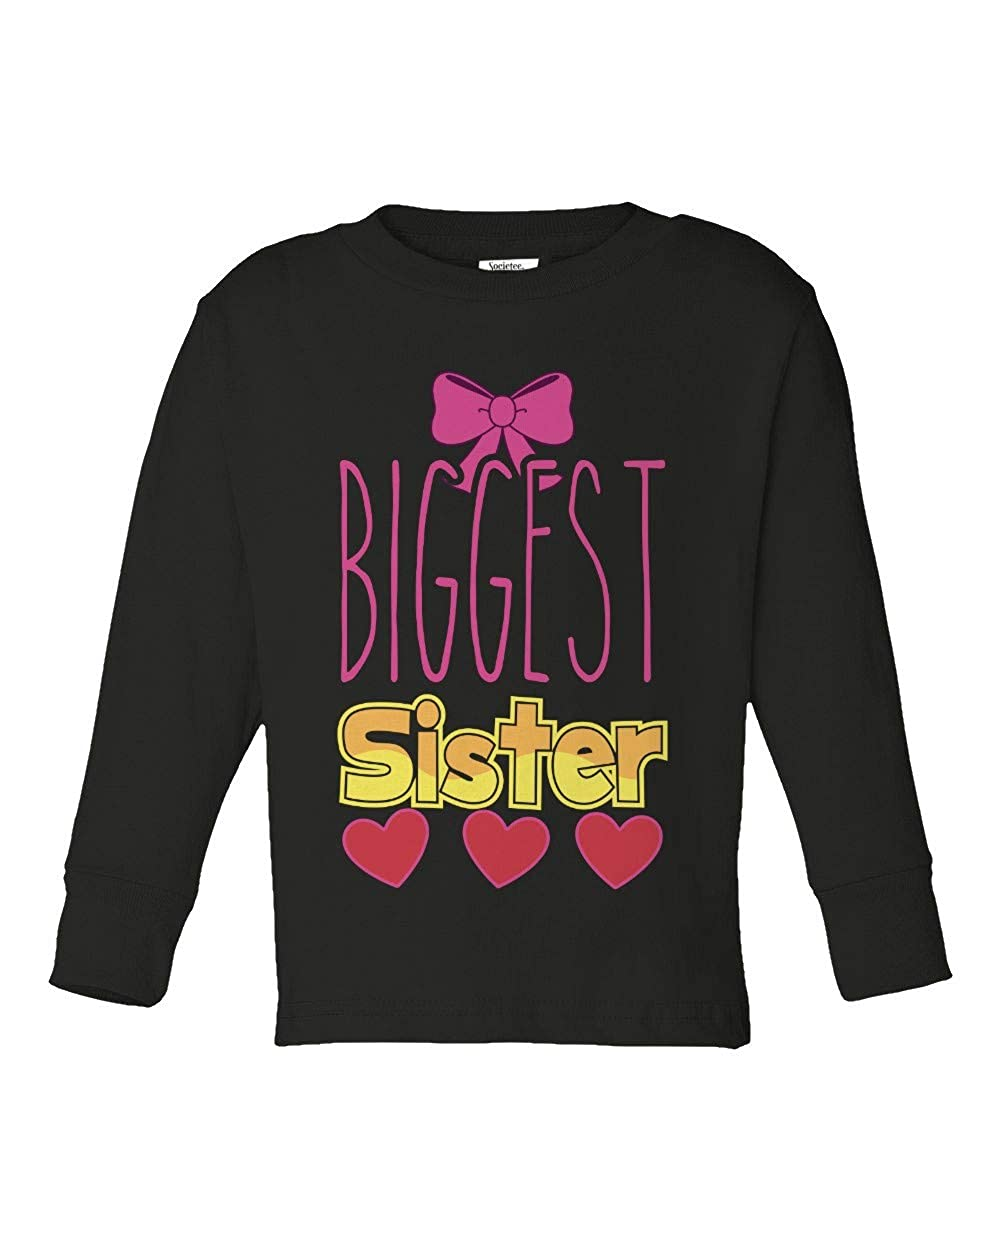 Societee Biggest Sister Cute Sibling Girls Toddler Long Sleeve T-Shirt